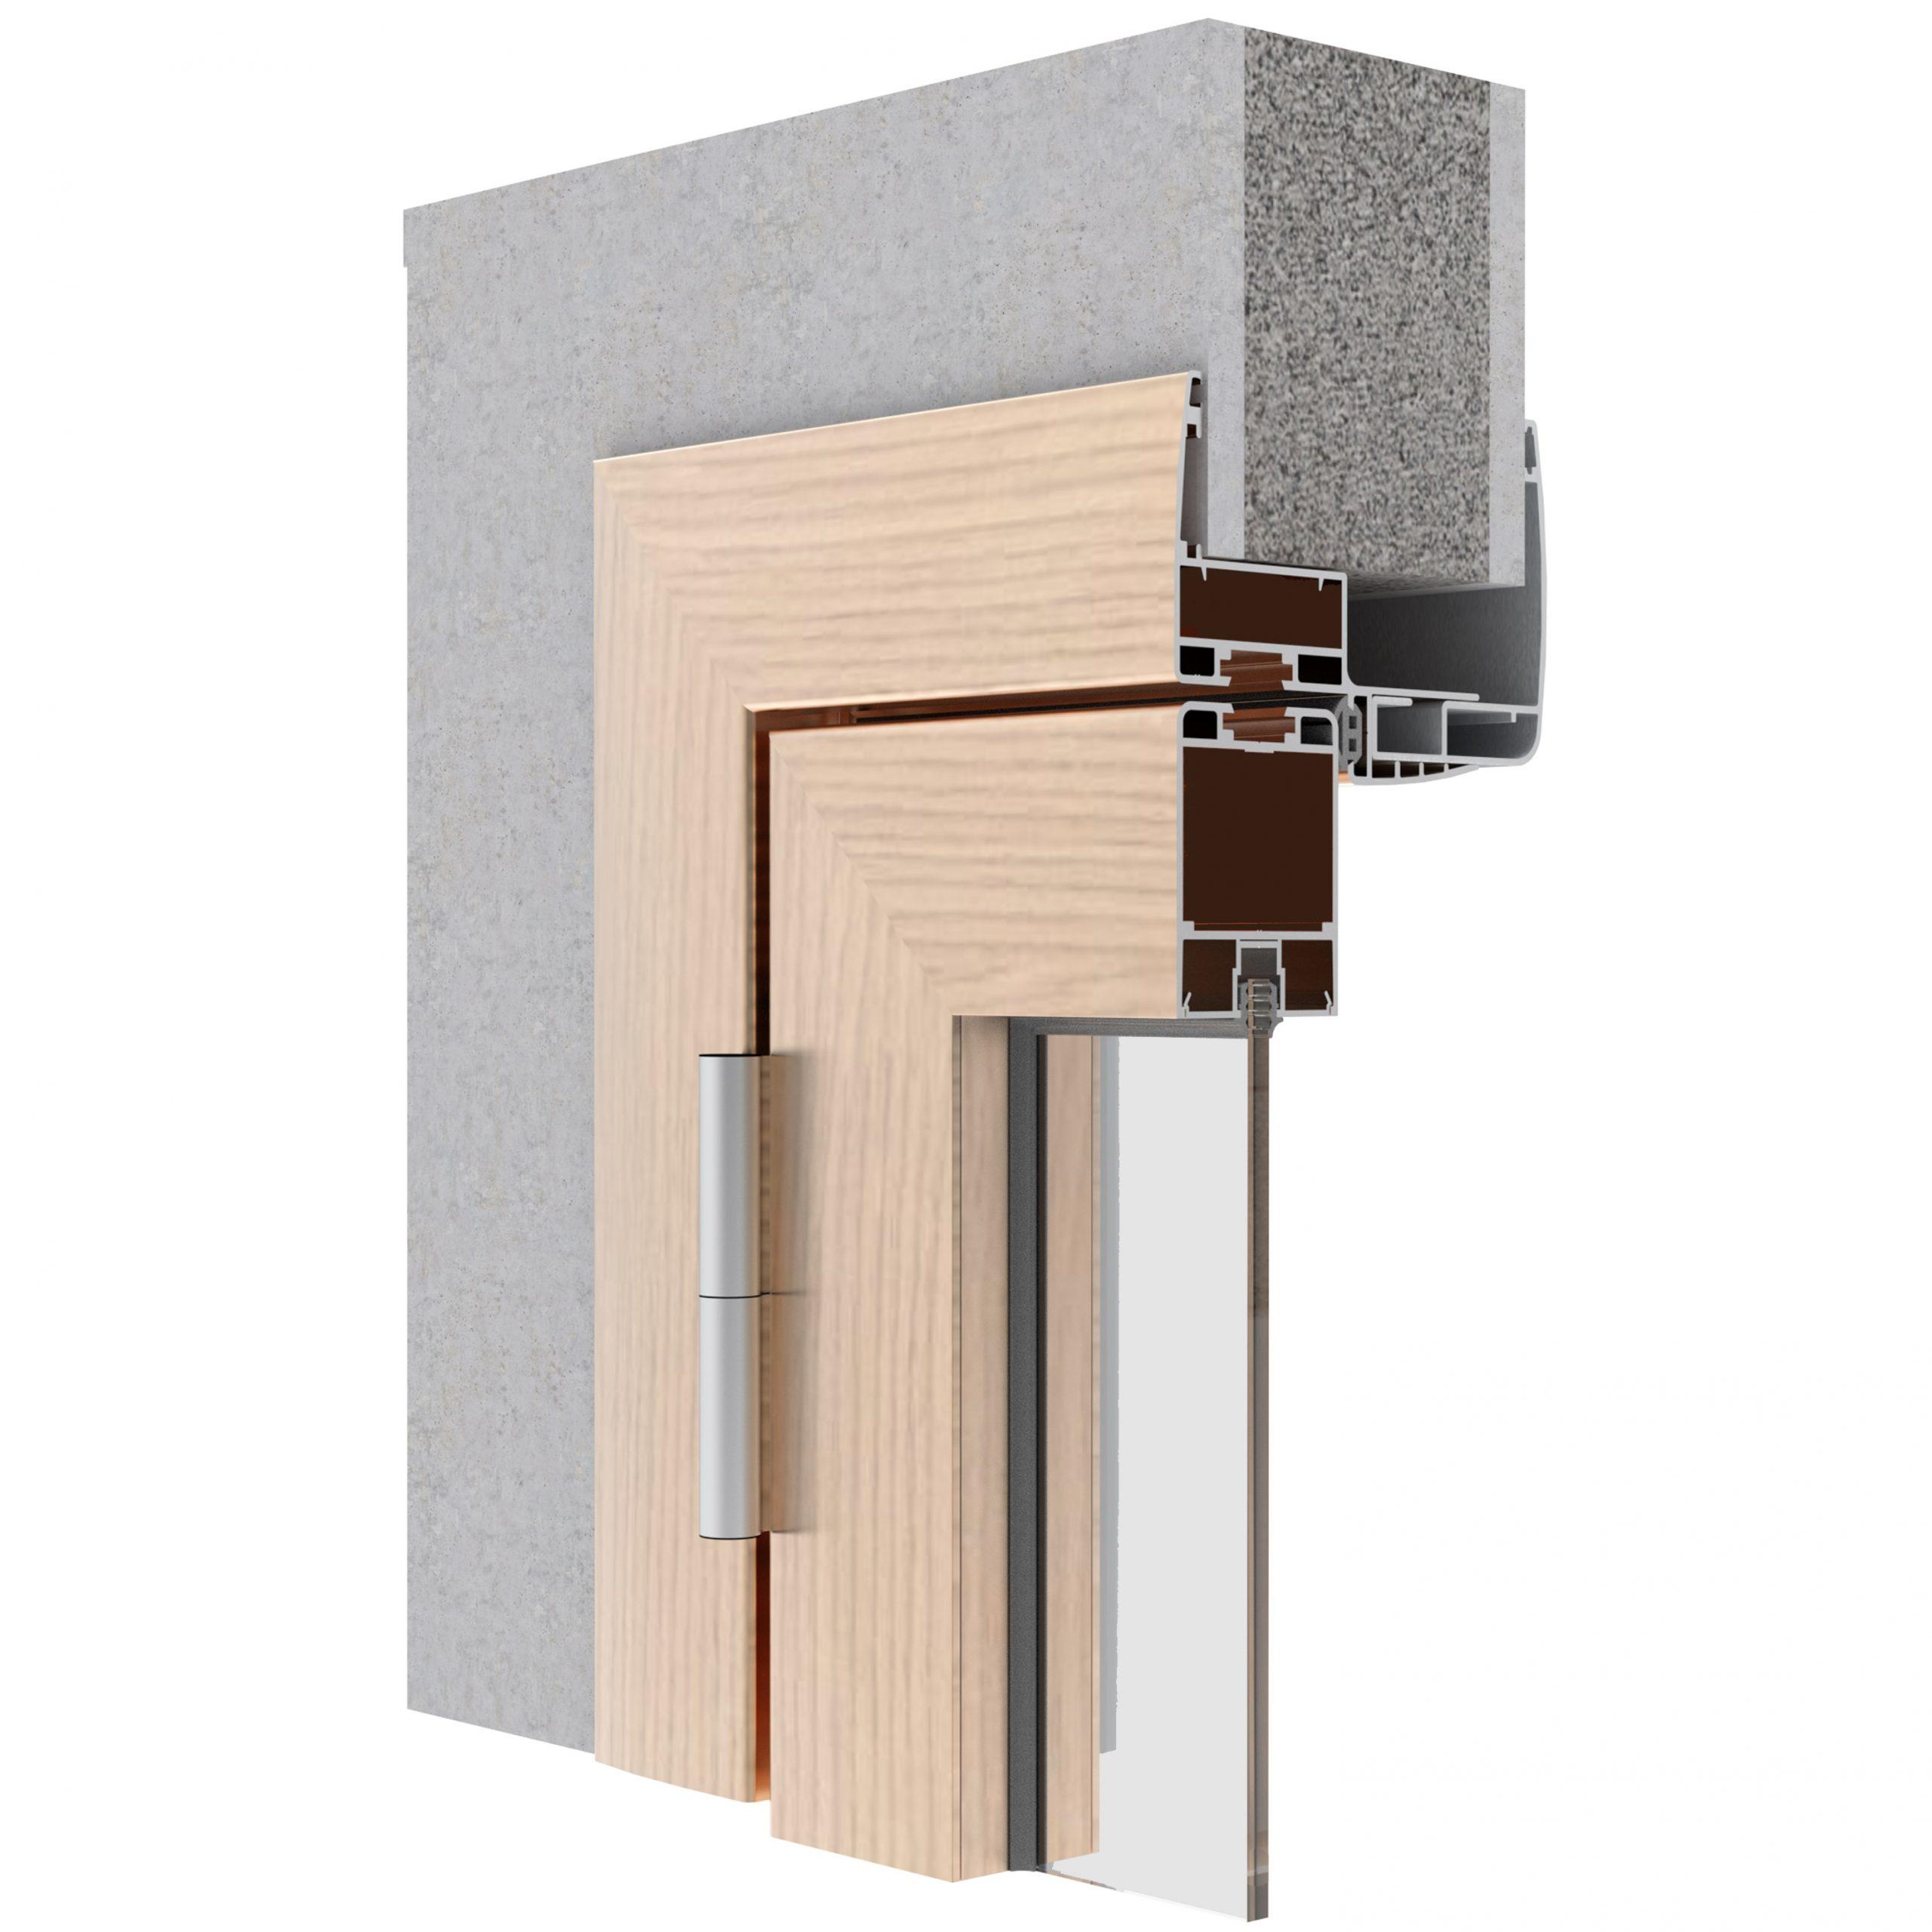 https://www.allpaint.it/wp-content/uploads/2021/07/porte-alluminio-curvo-vetro-allpaint-scaled.jpg